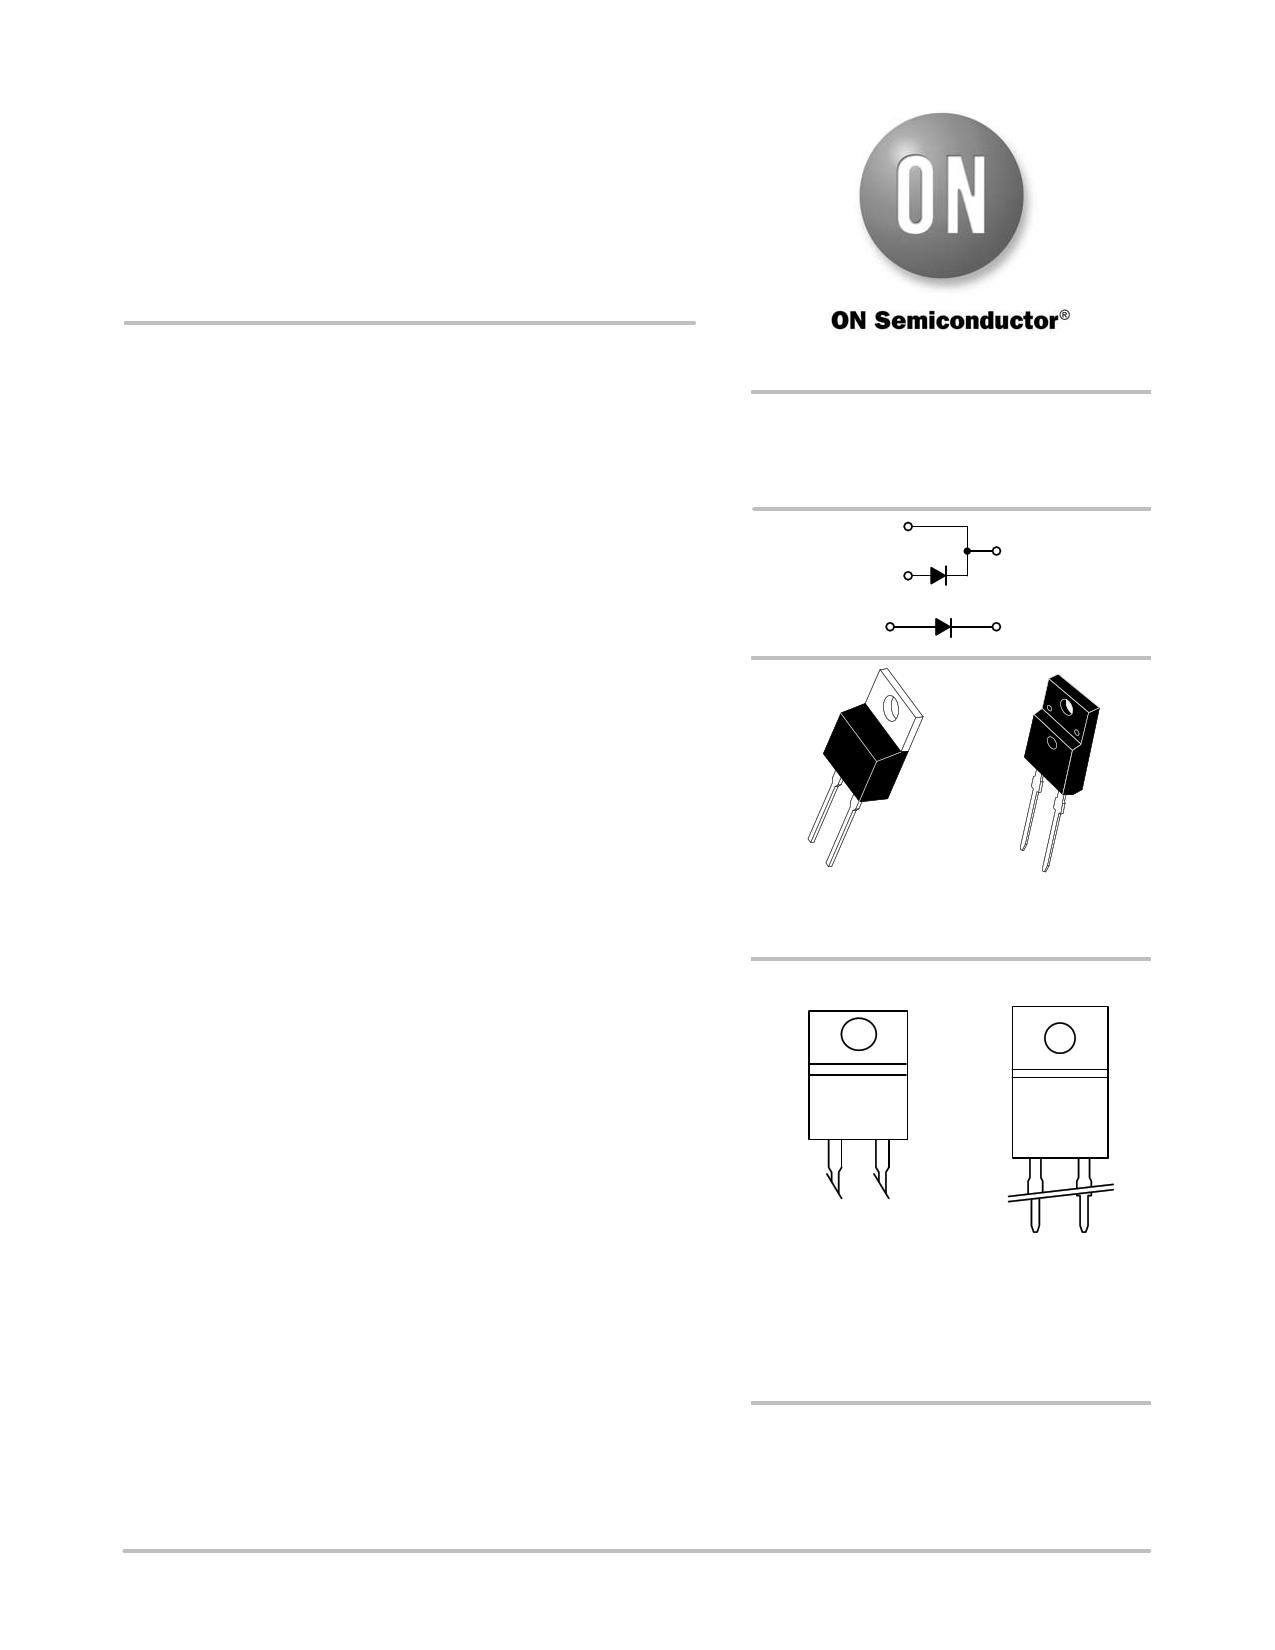 MUR860G datasheet